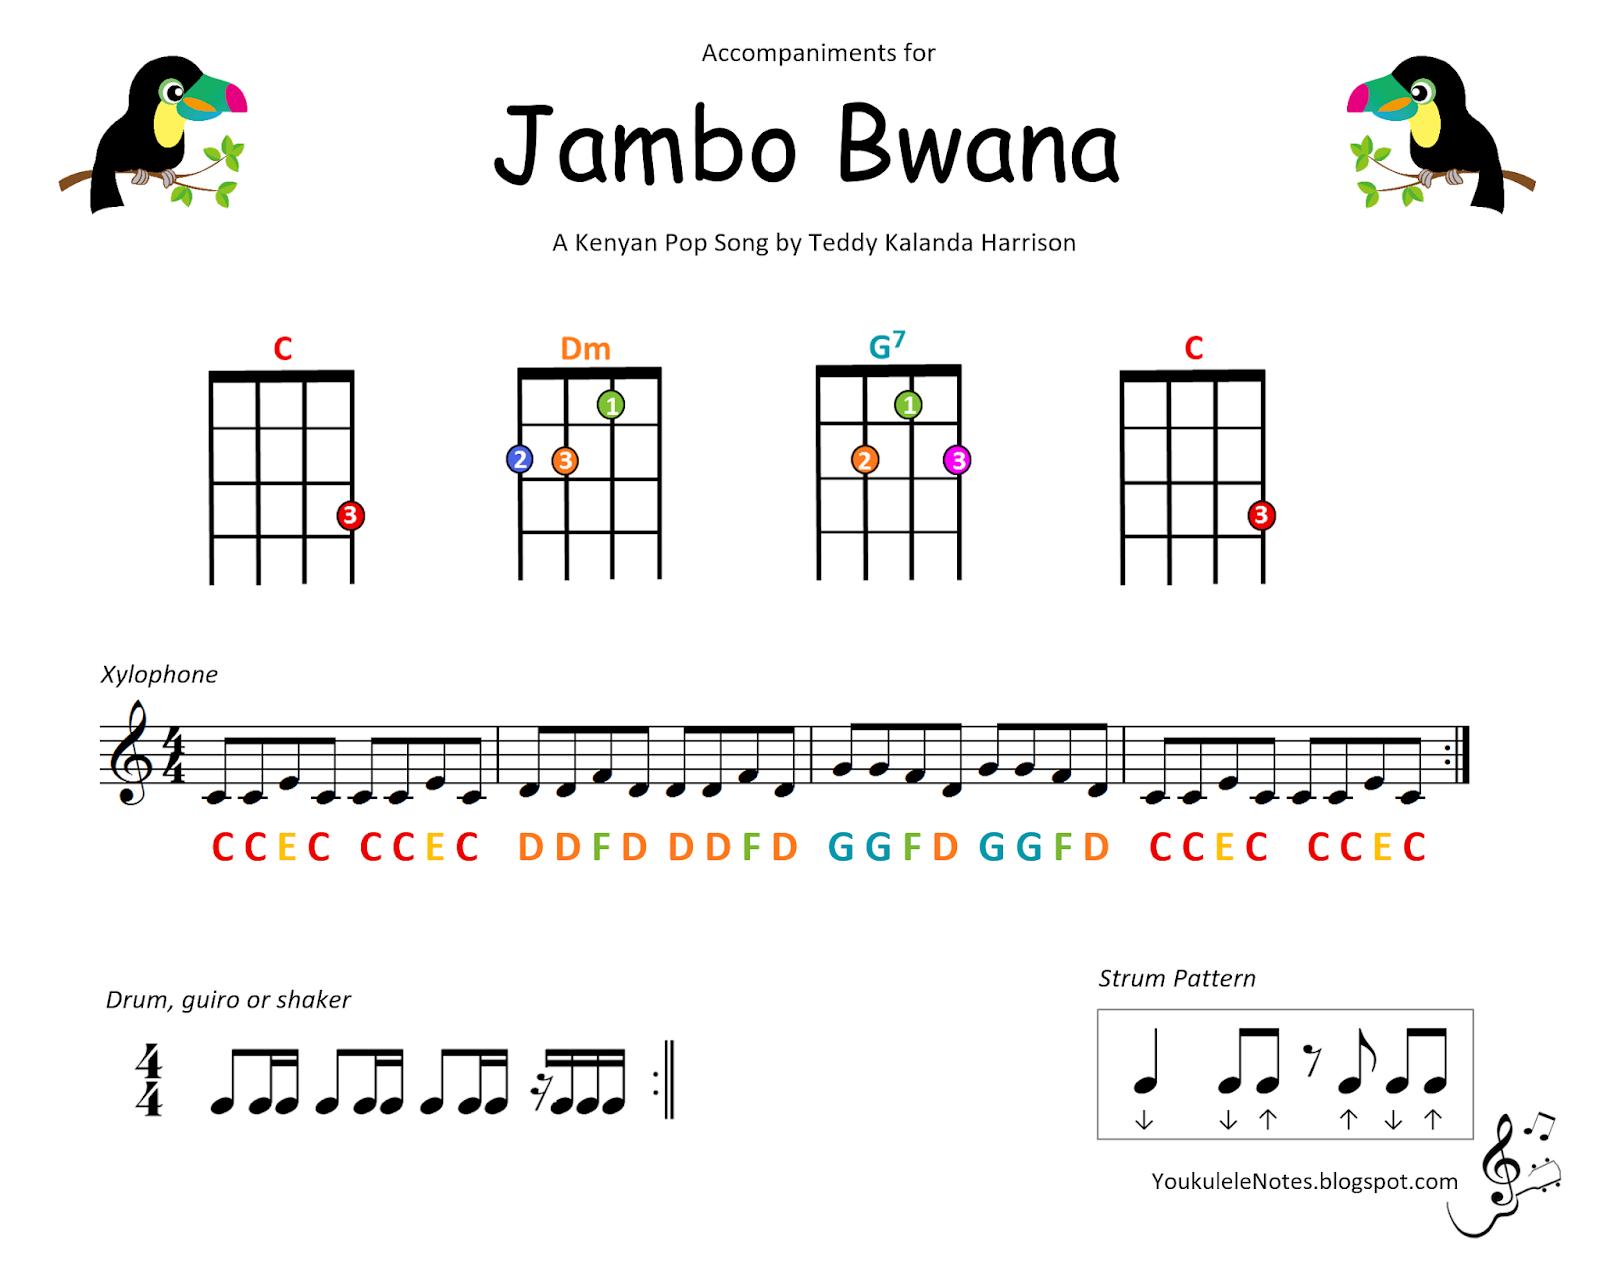 Madison : Jambo bwana